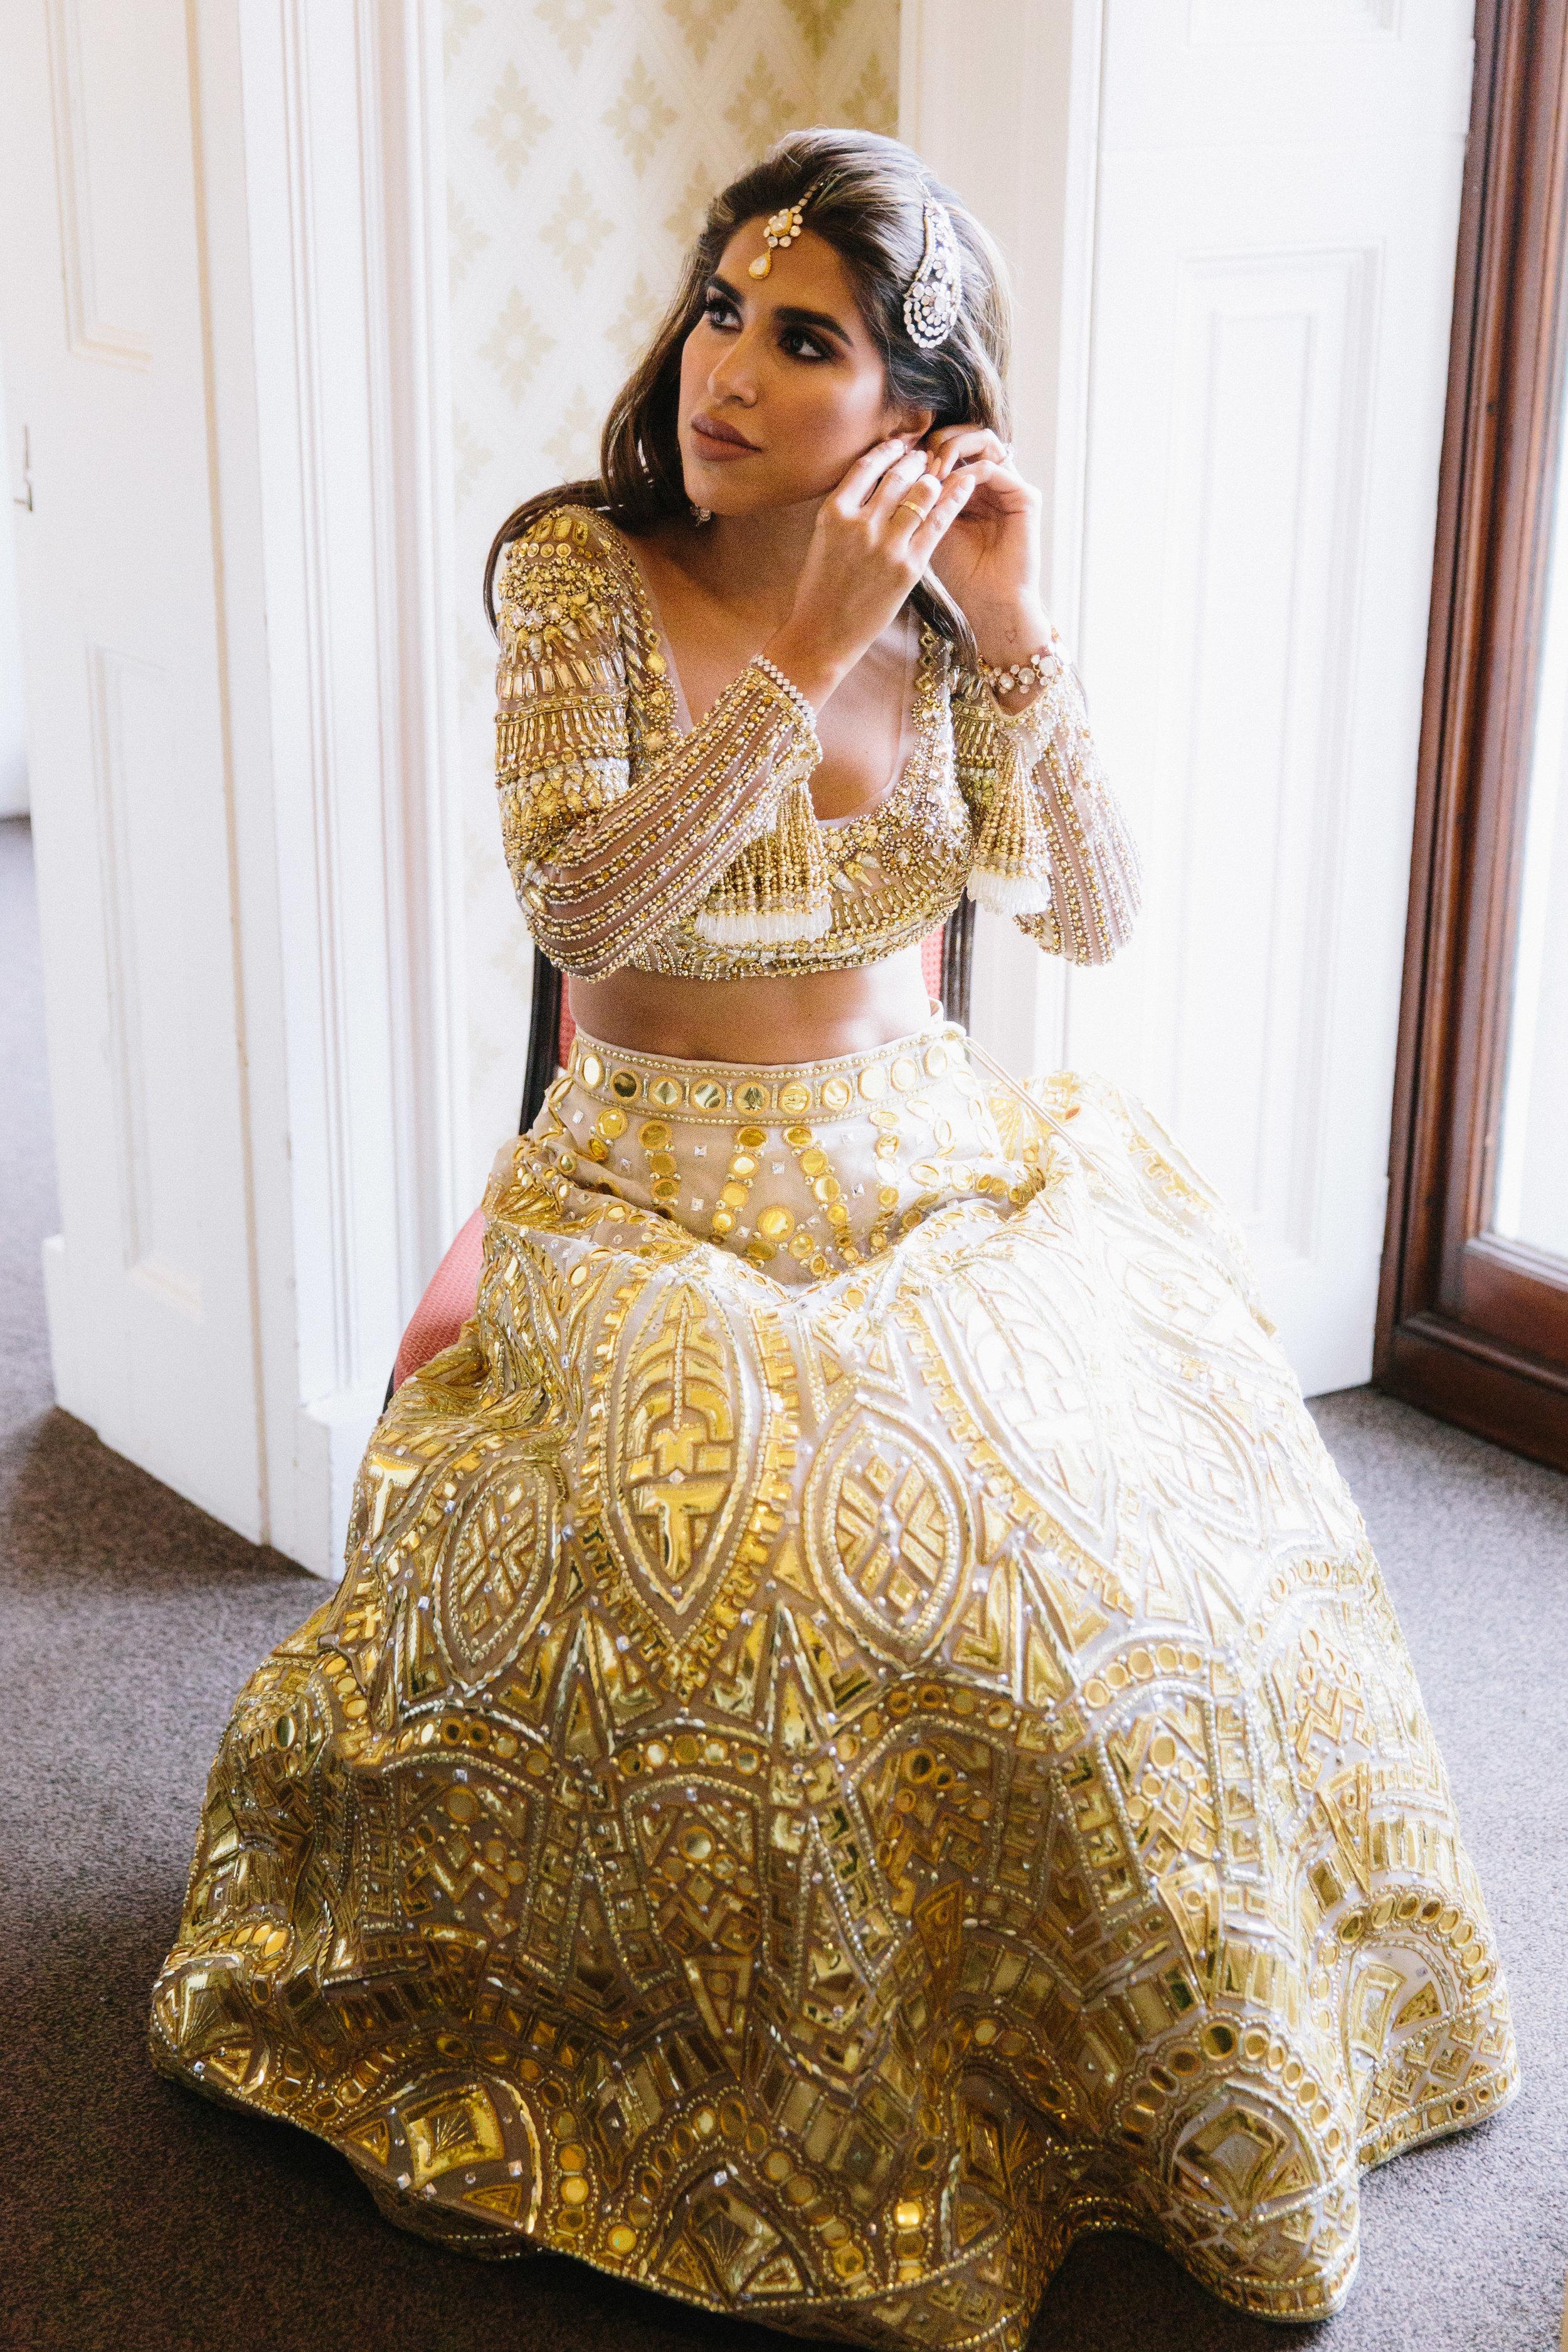 alternative asian Mehndi and wedding in Tatton Park - Michael Newington Gray-1.jpg